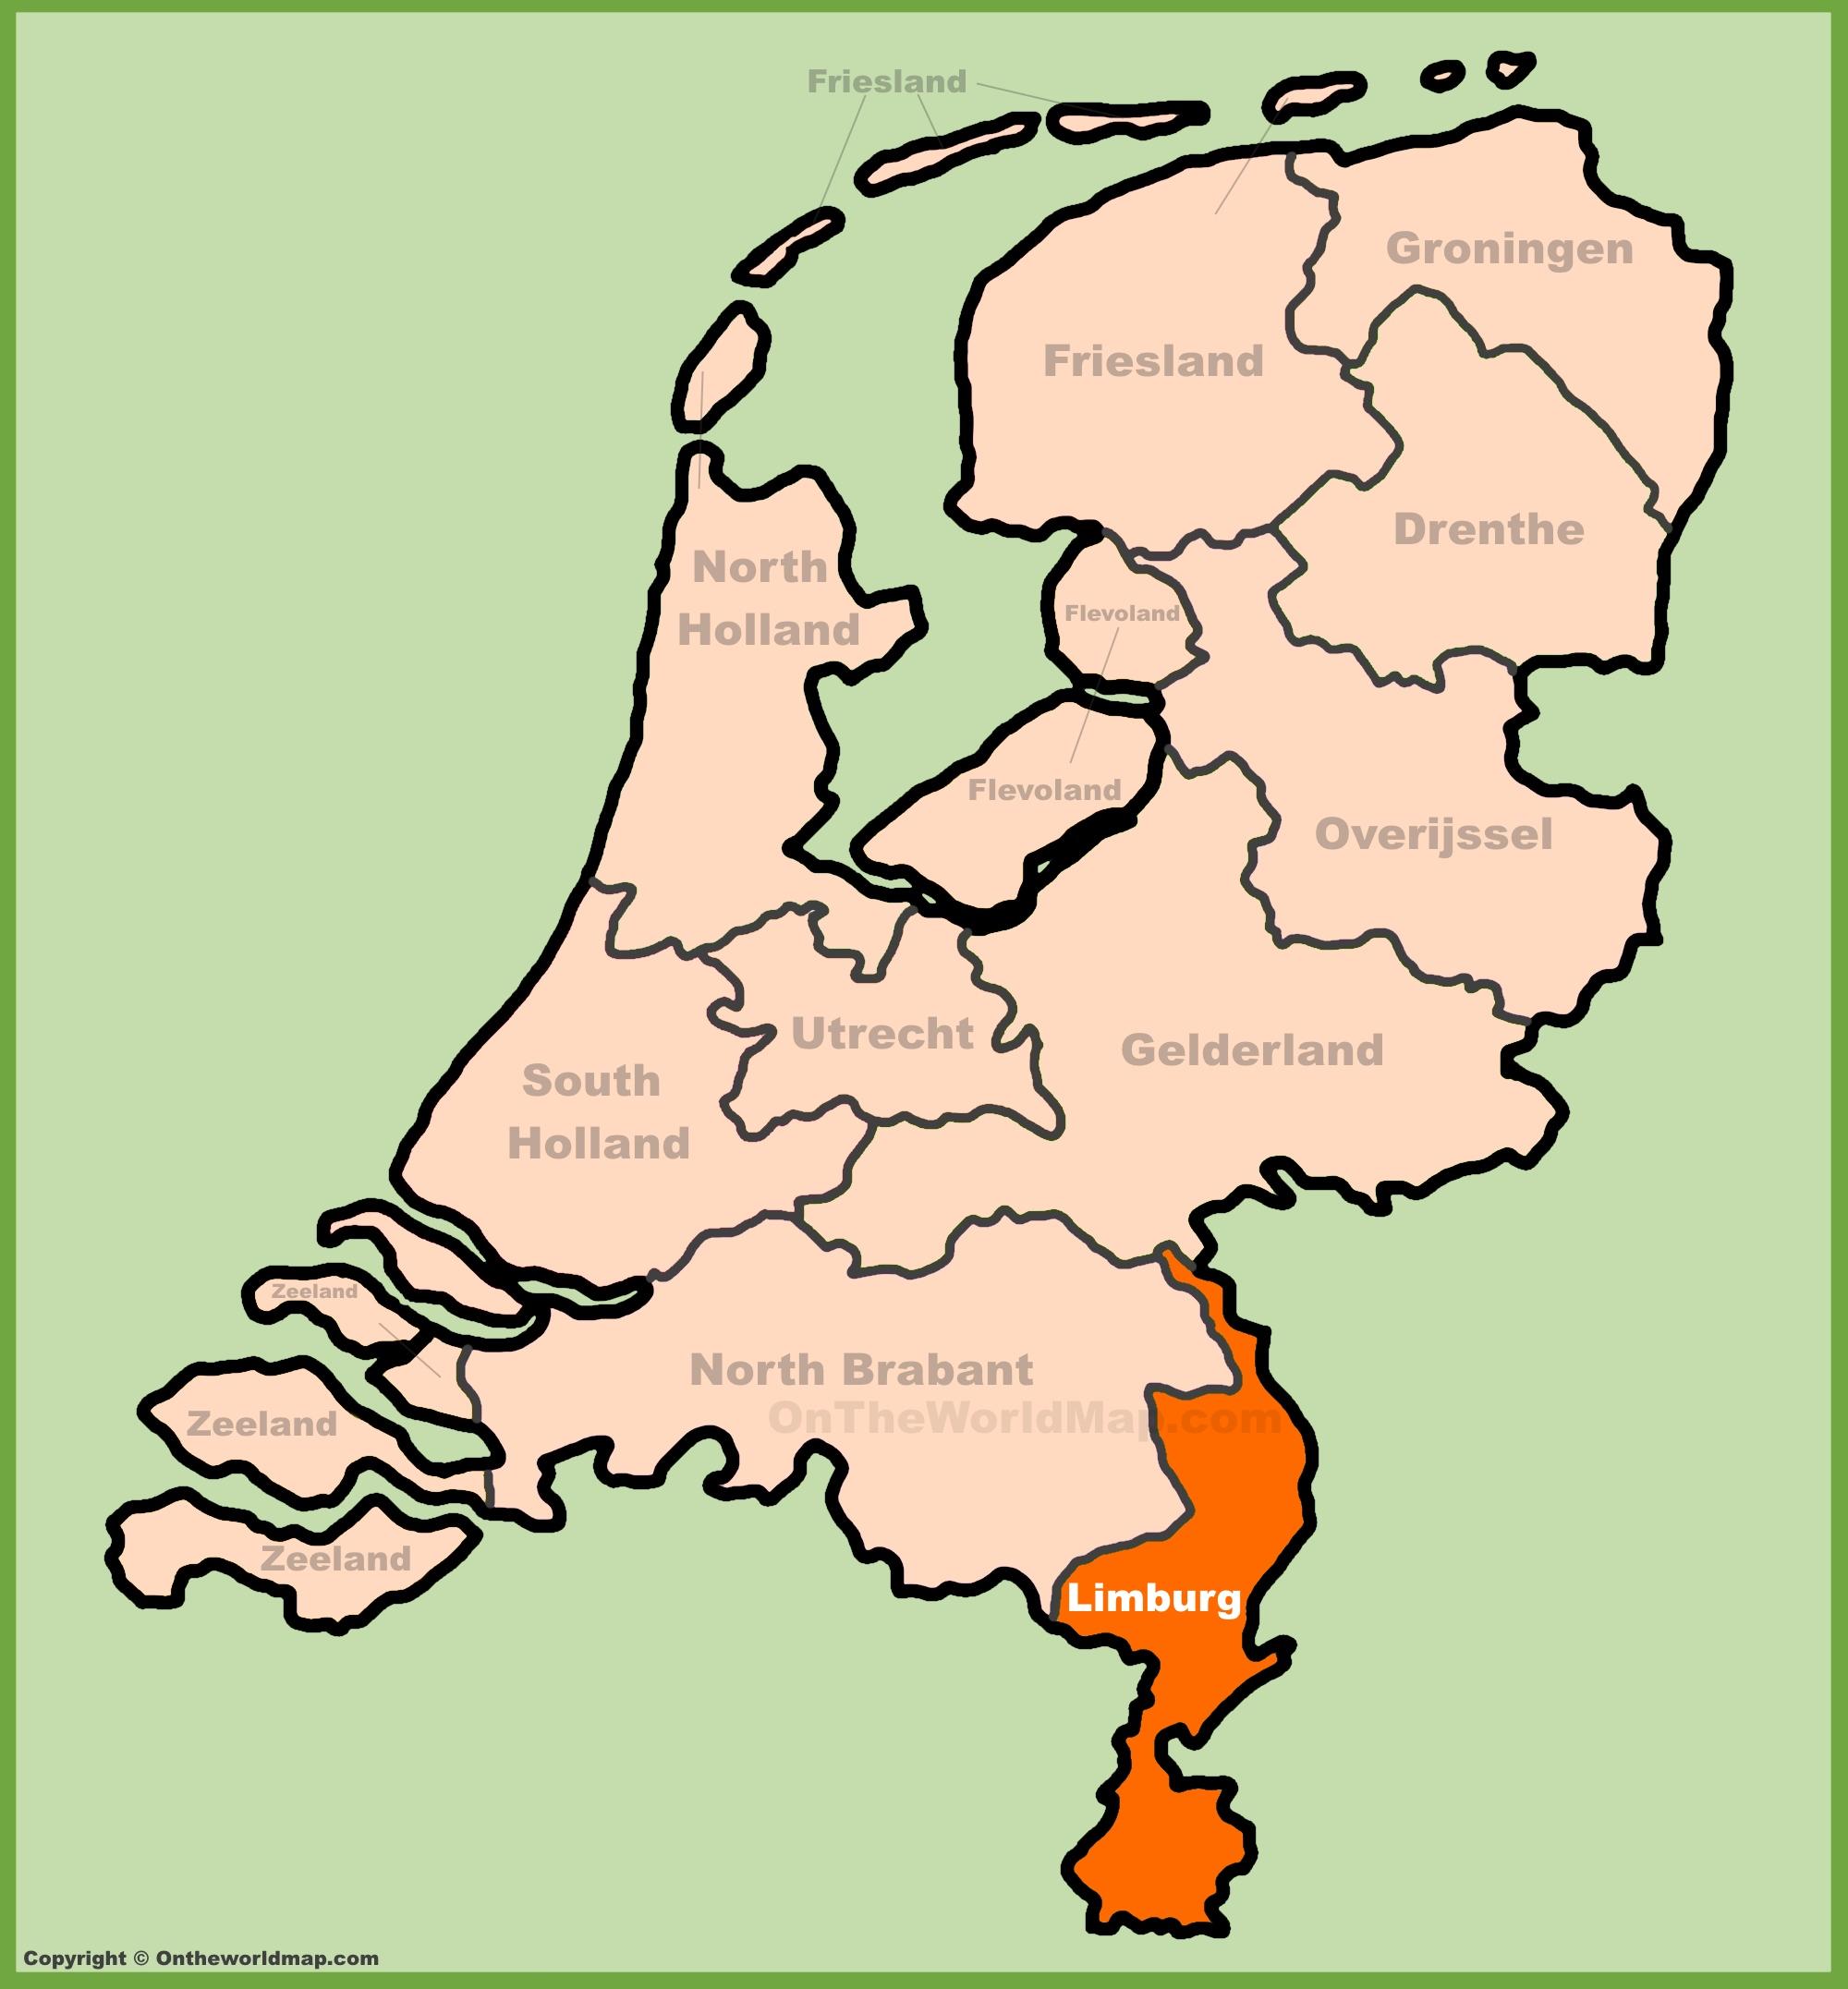 Limburg Location On The Netherlands Map